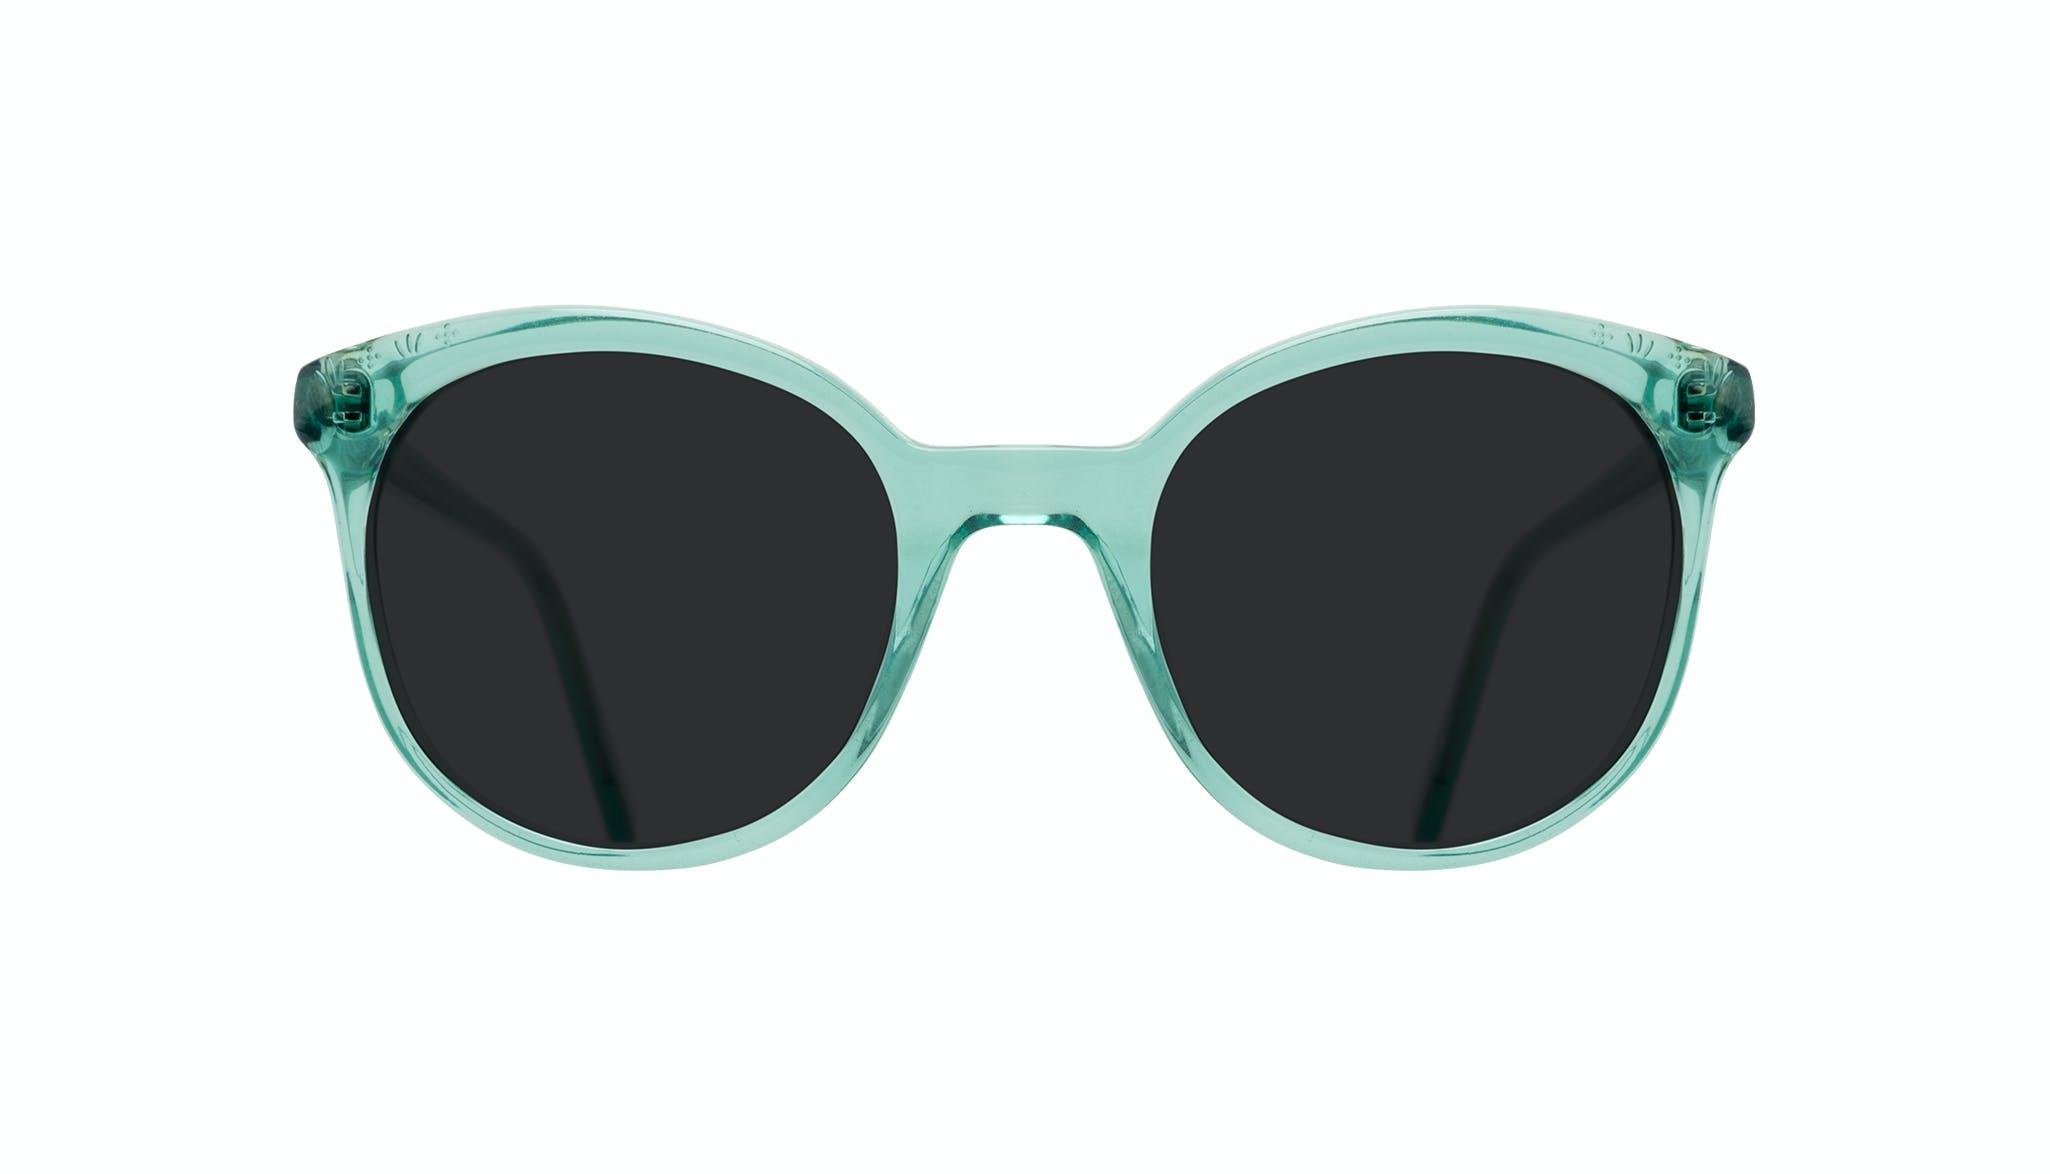 Affordable Fashion Glasses Round Sunglasses Women Must Emeraude